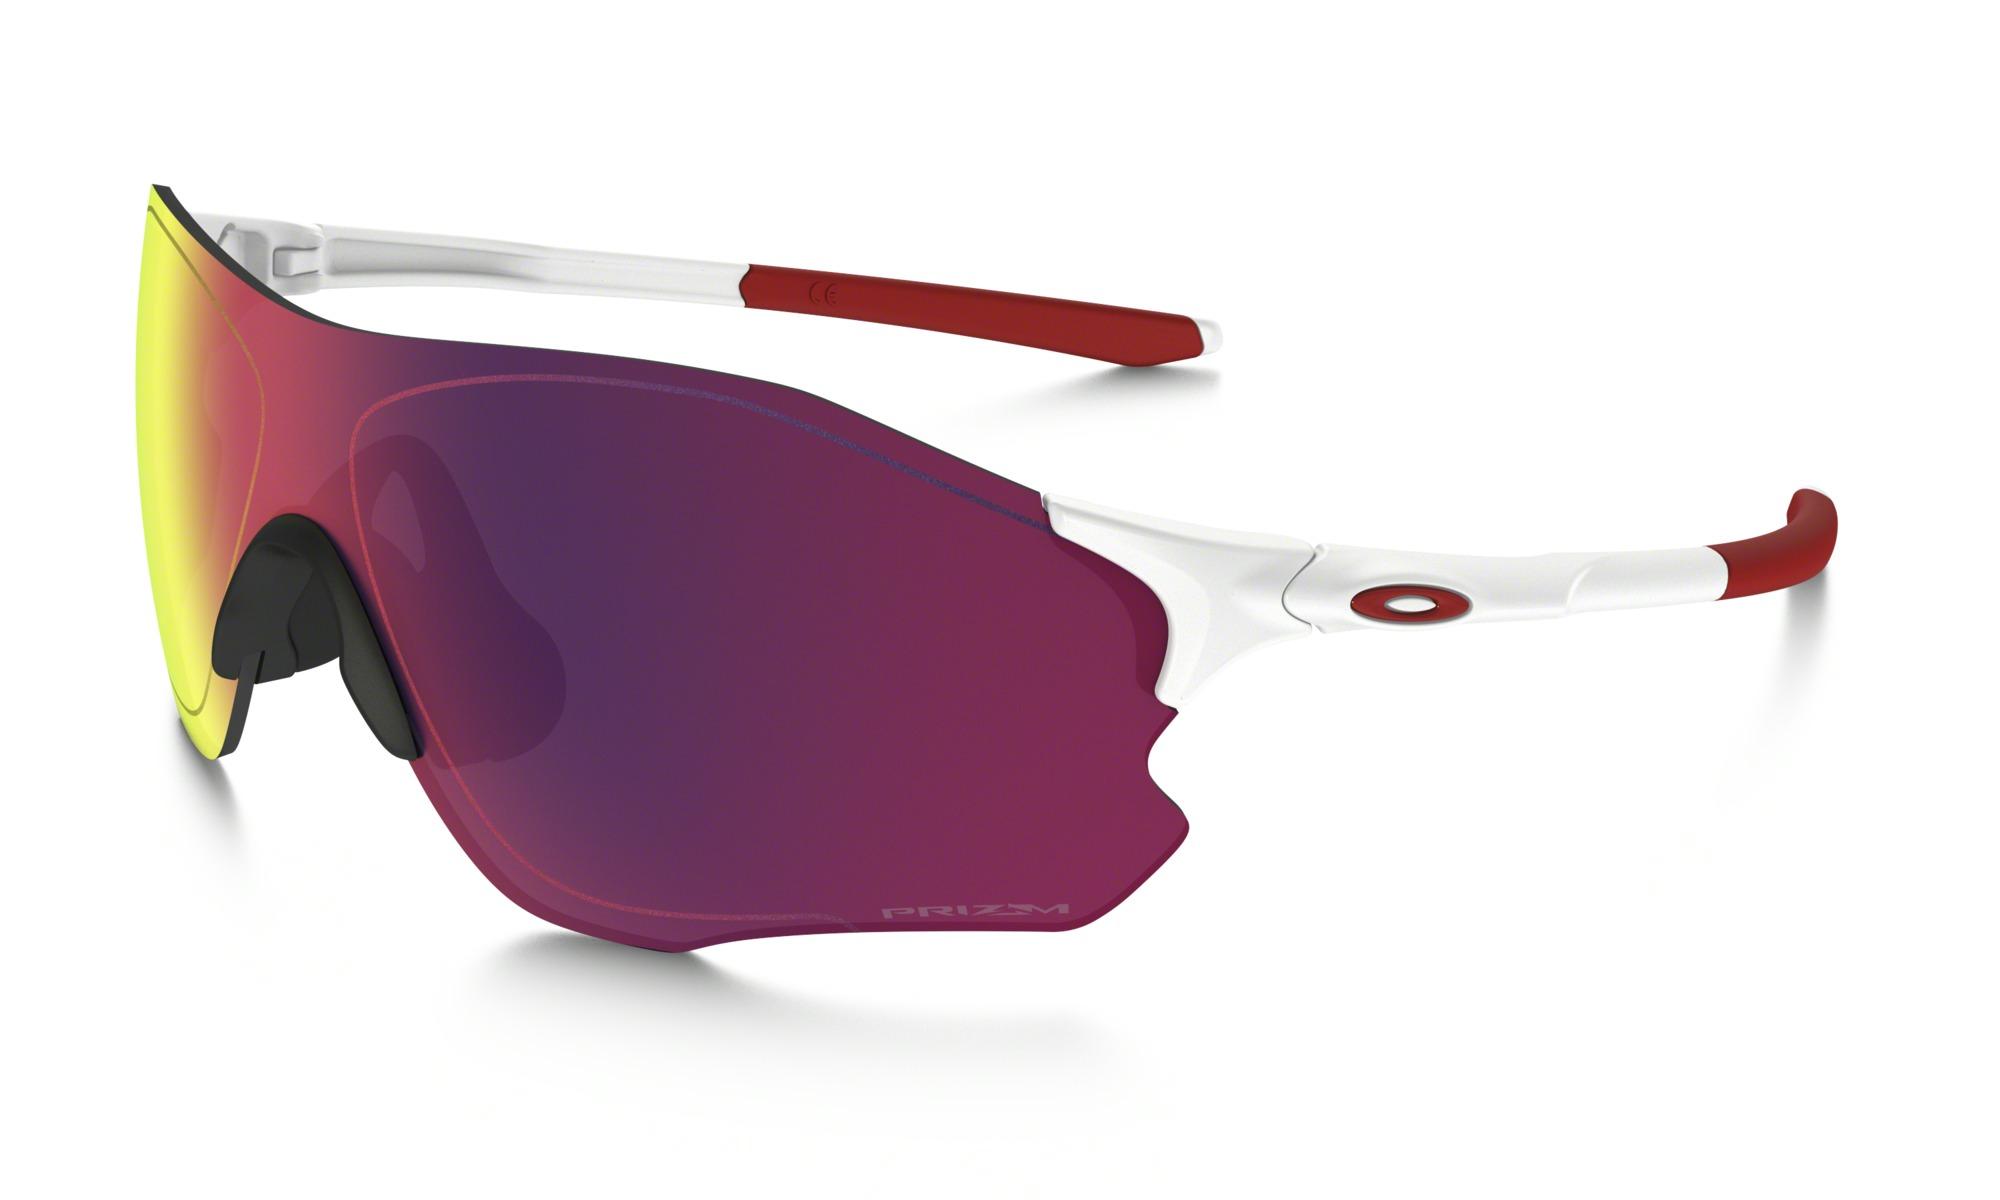 d0bf9dbc800c Oakley EVZERO Prizm Road Sunglasses | Merlin Cycles